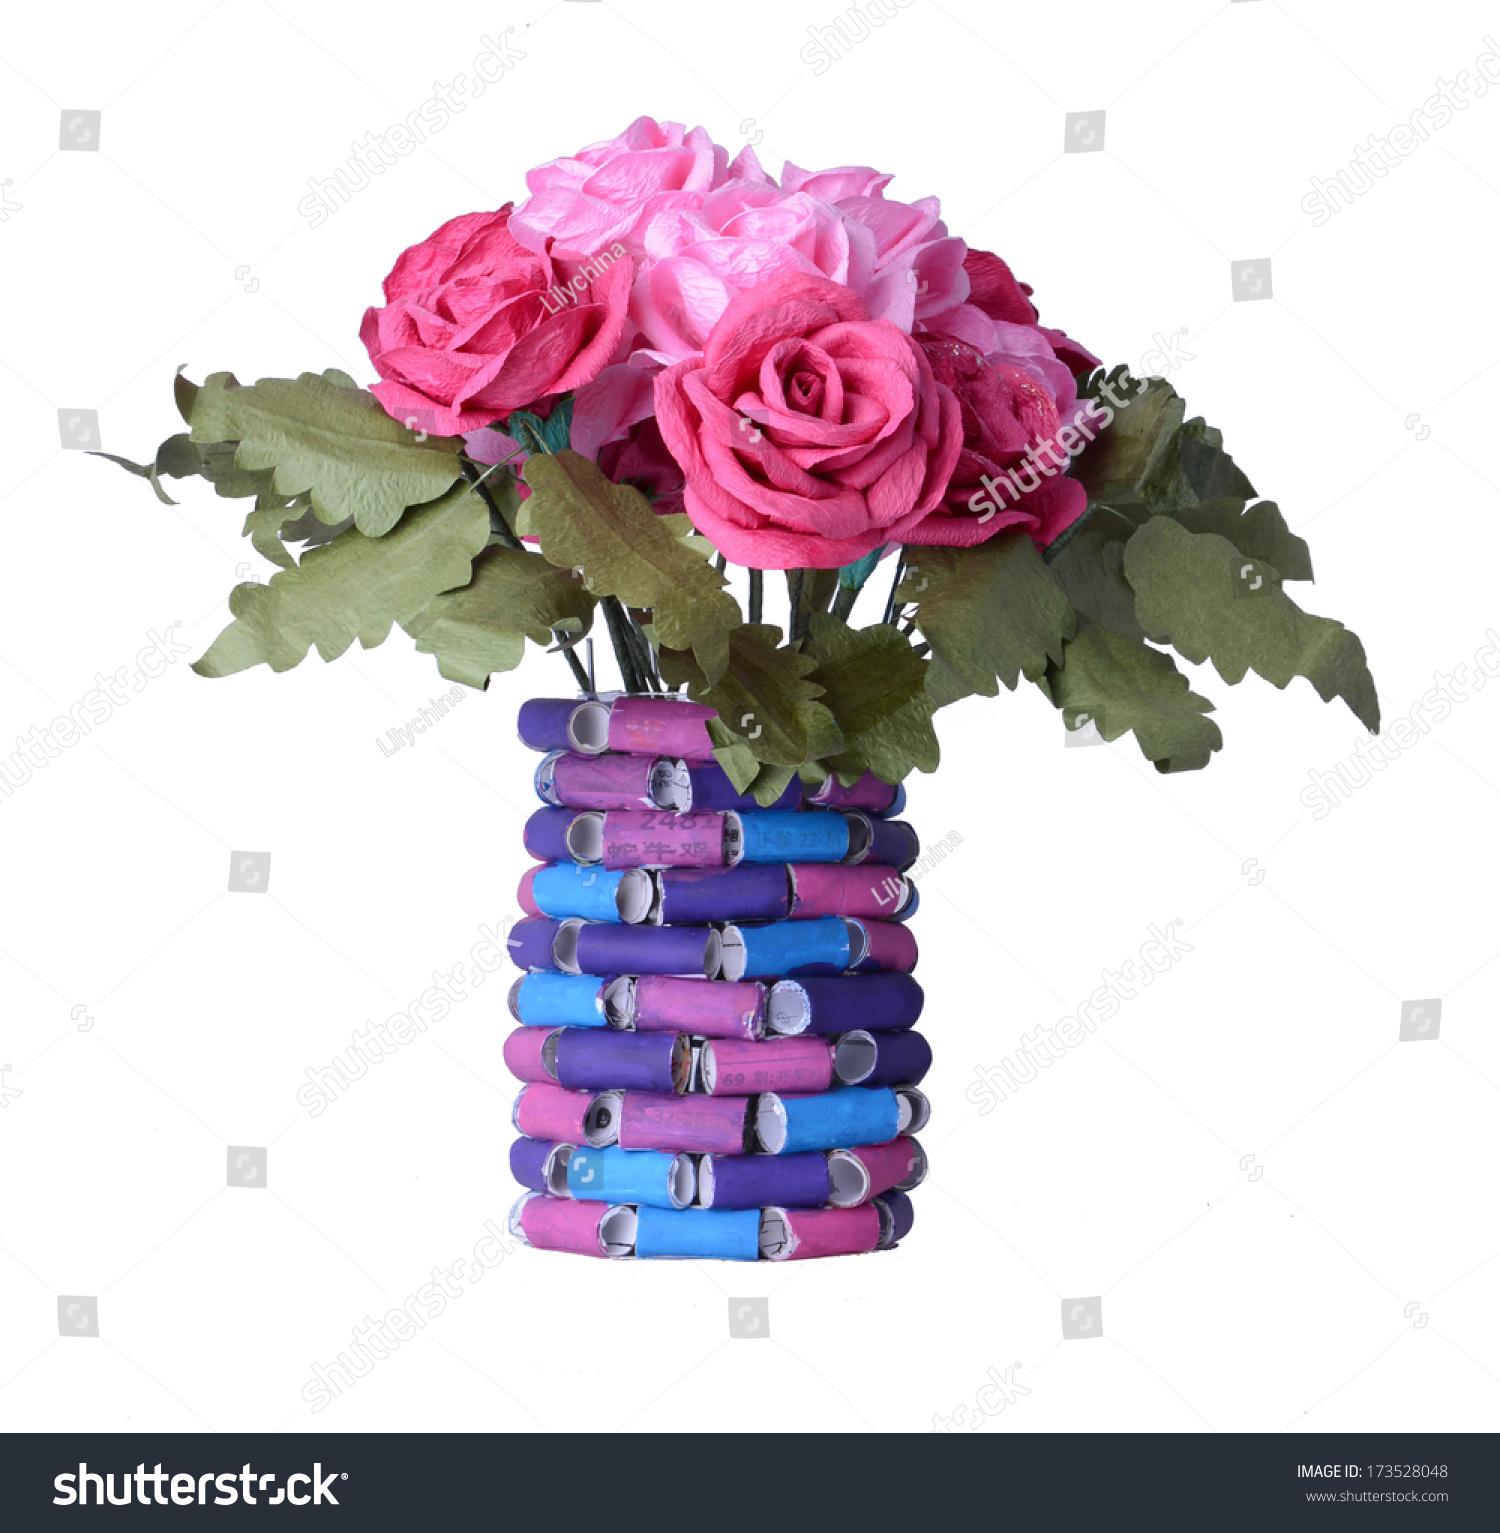 Beautiful flowers vases made paper stock photo edit now 173528048 beautiful flowers and vases are made of paper izmirmasajfo